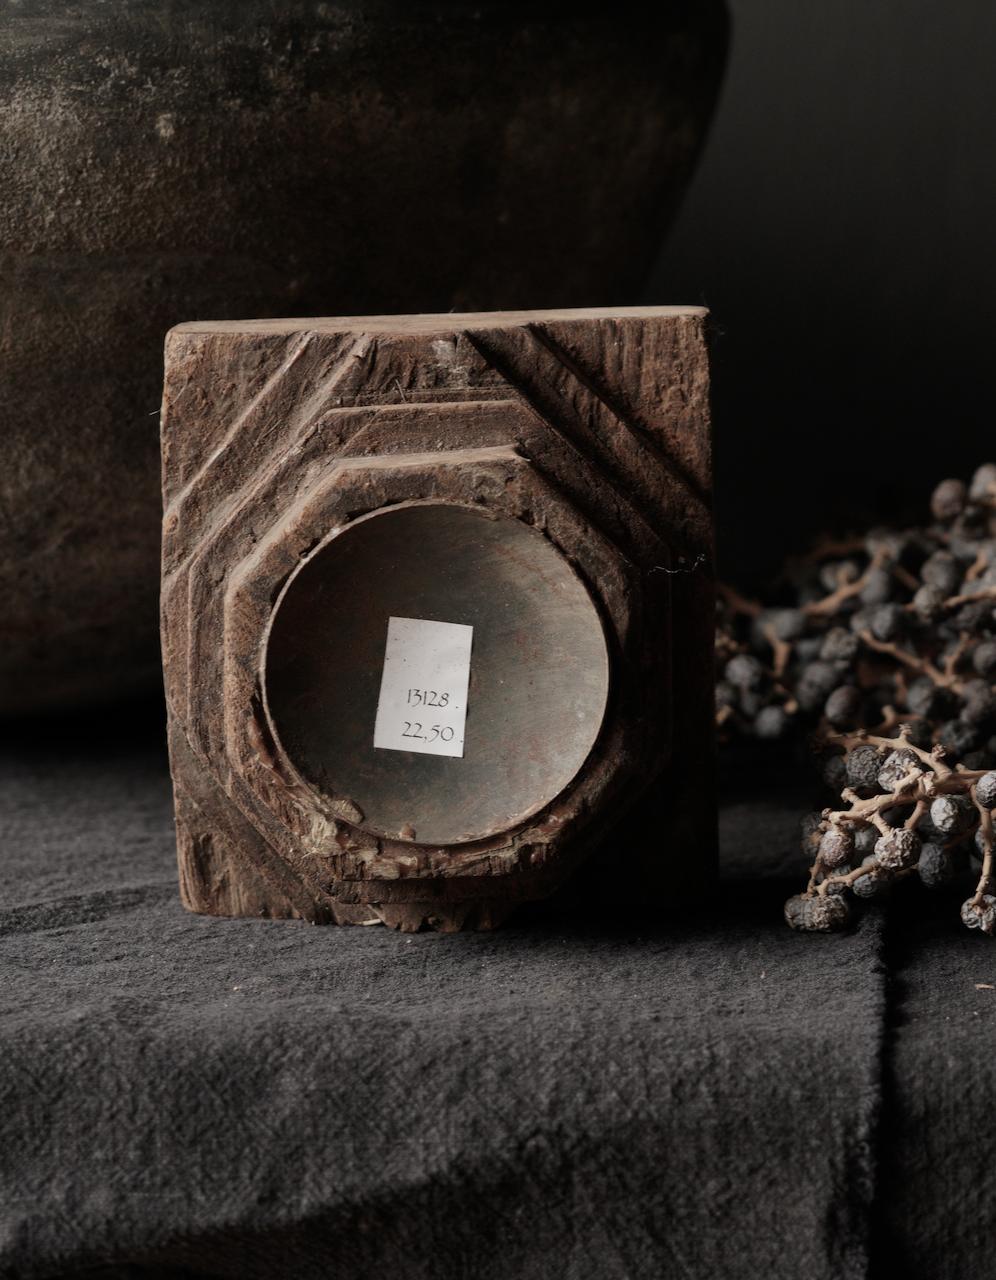 Houten Kandelaars van oud ornament-6